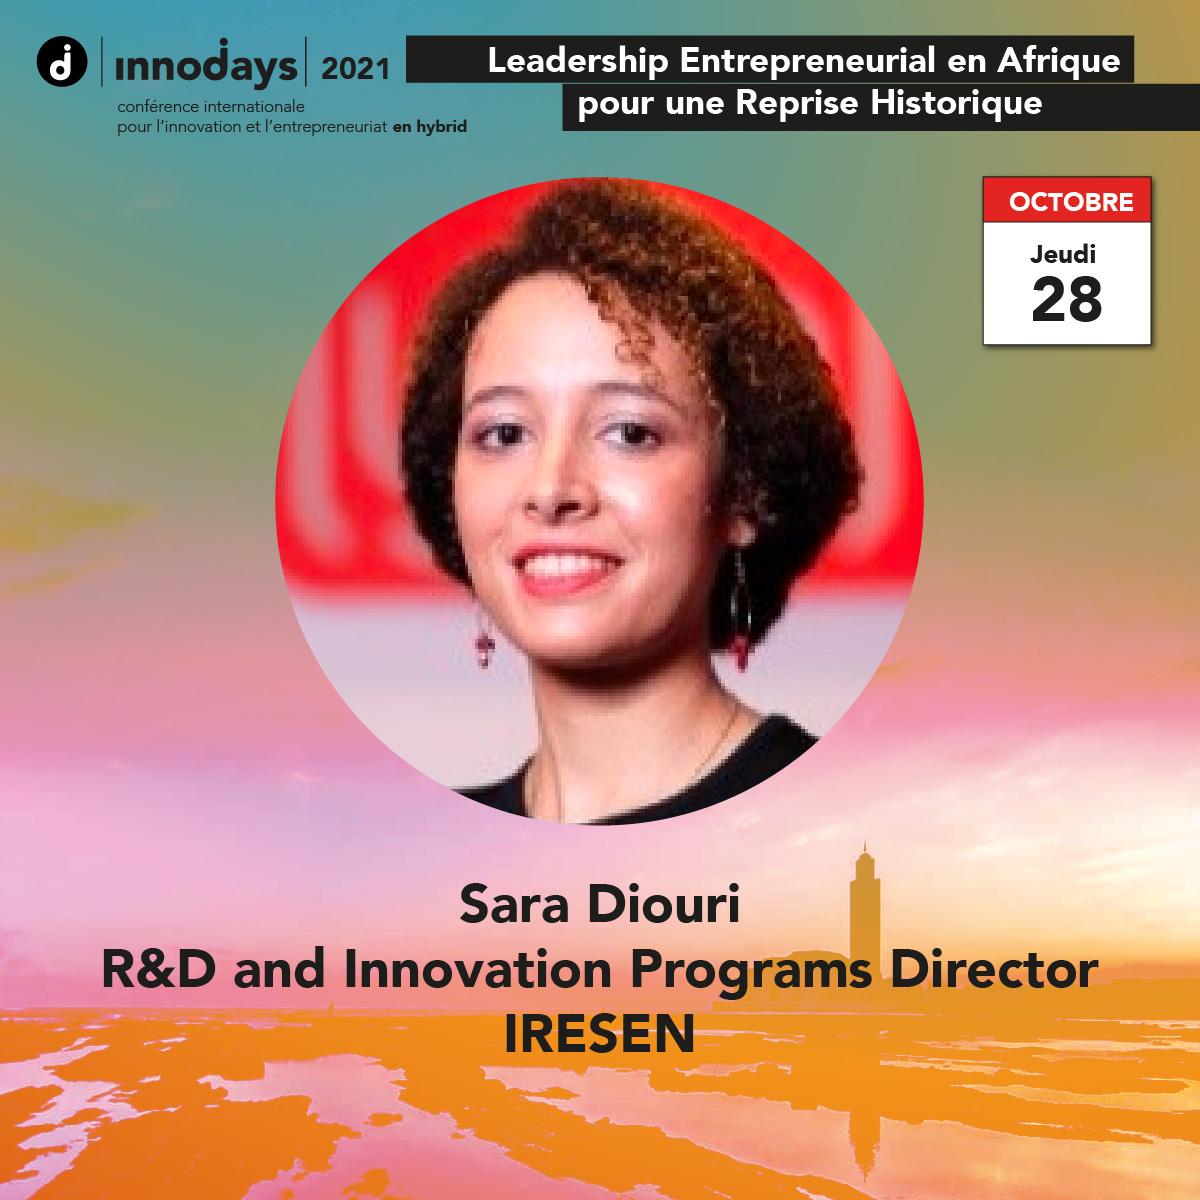 Sara Diouri - Directrice R&D et Innovation - IRESEN